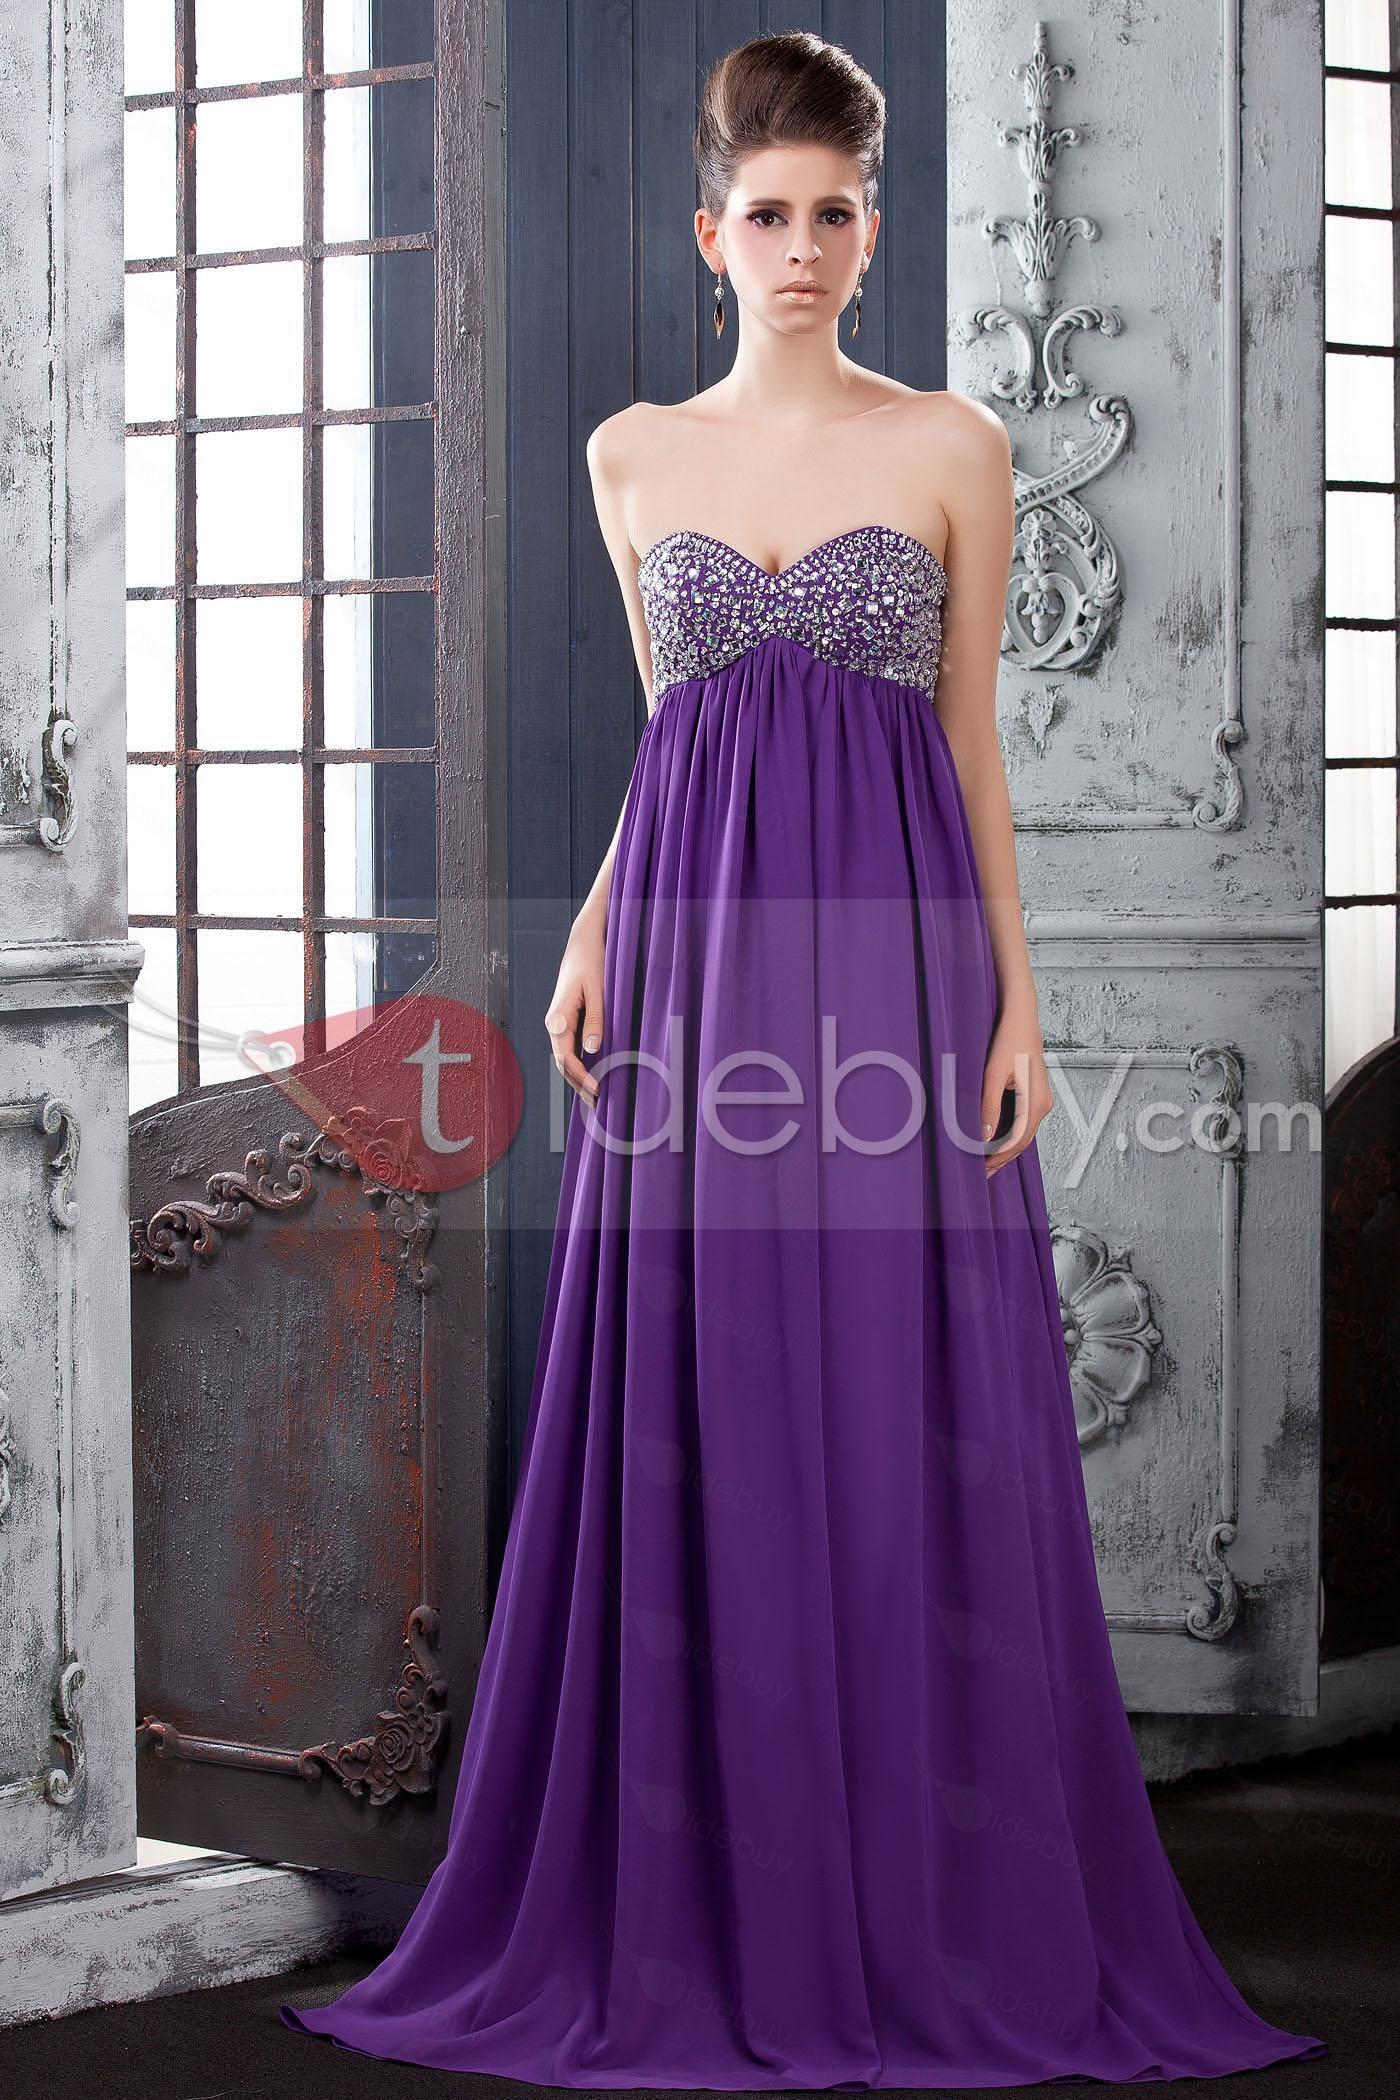 prom dress | Dresses | Pinterest